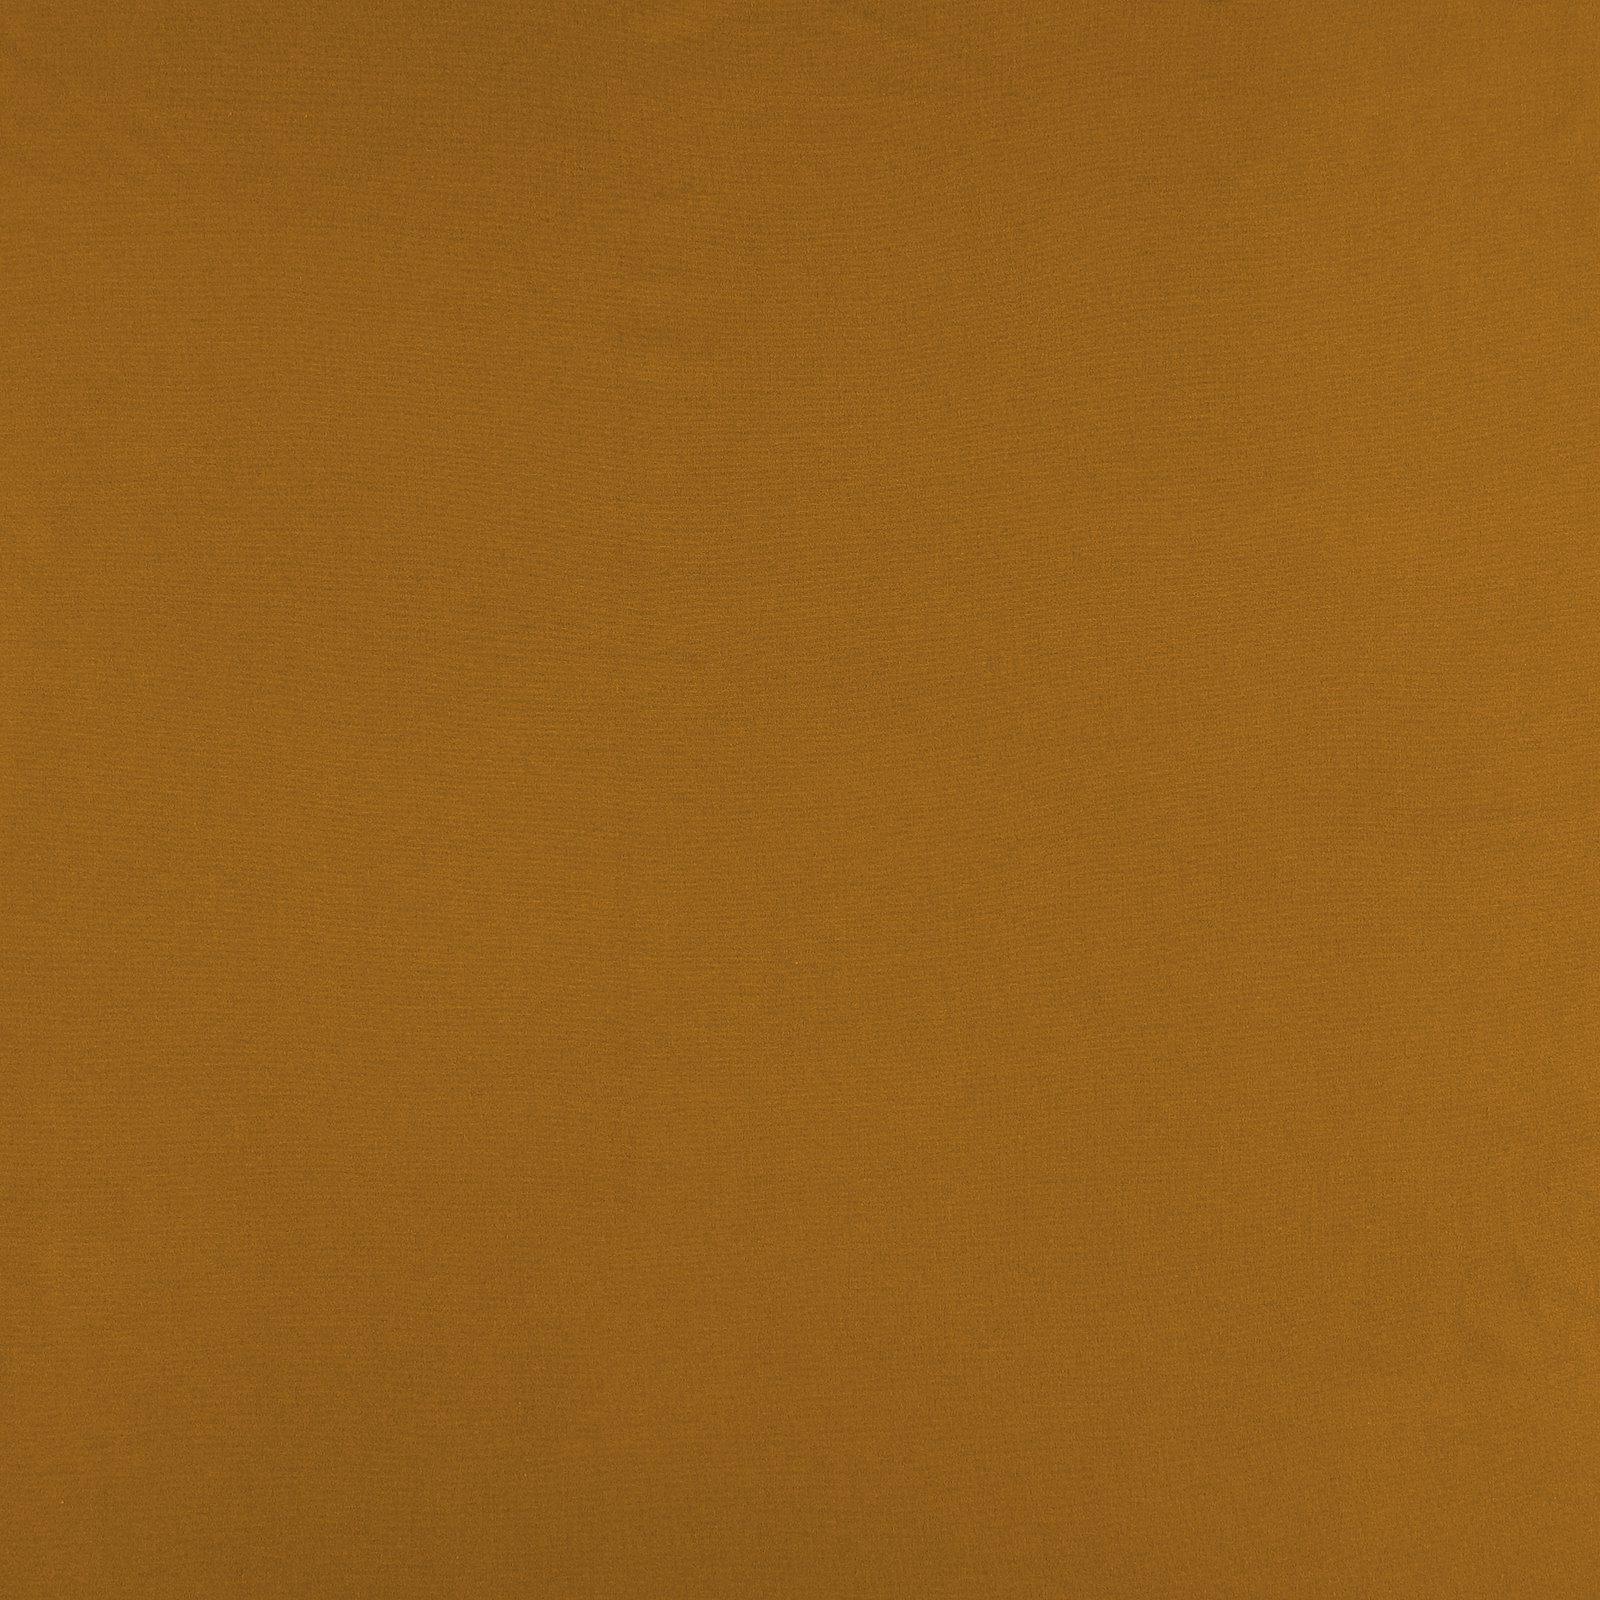 Ponte de roma dark golden brown 272311_pack_solid